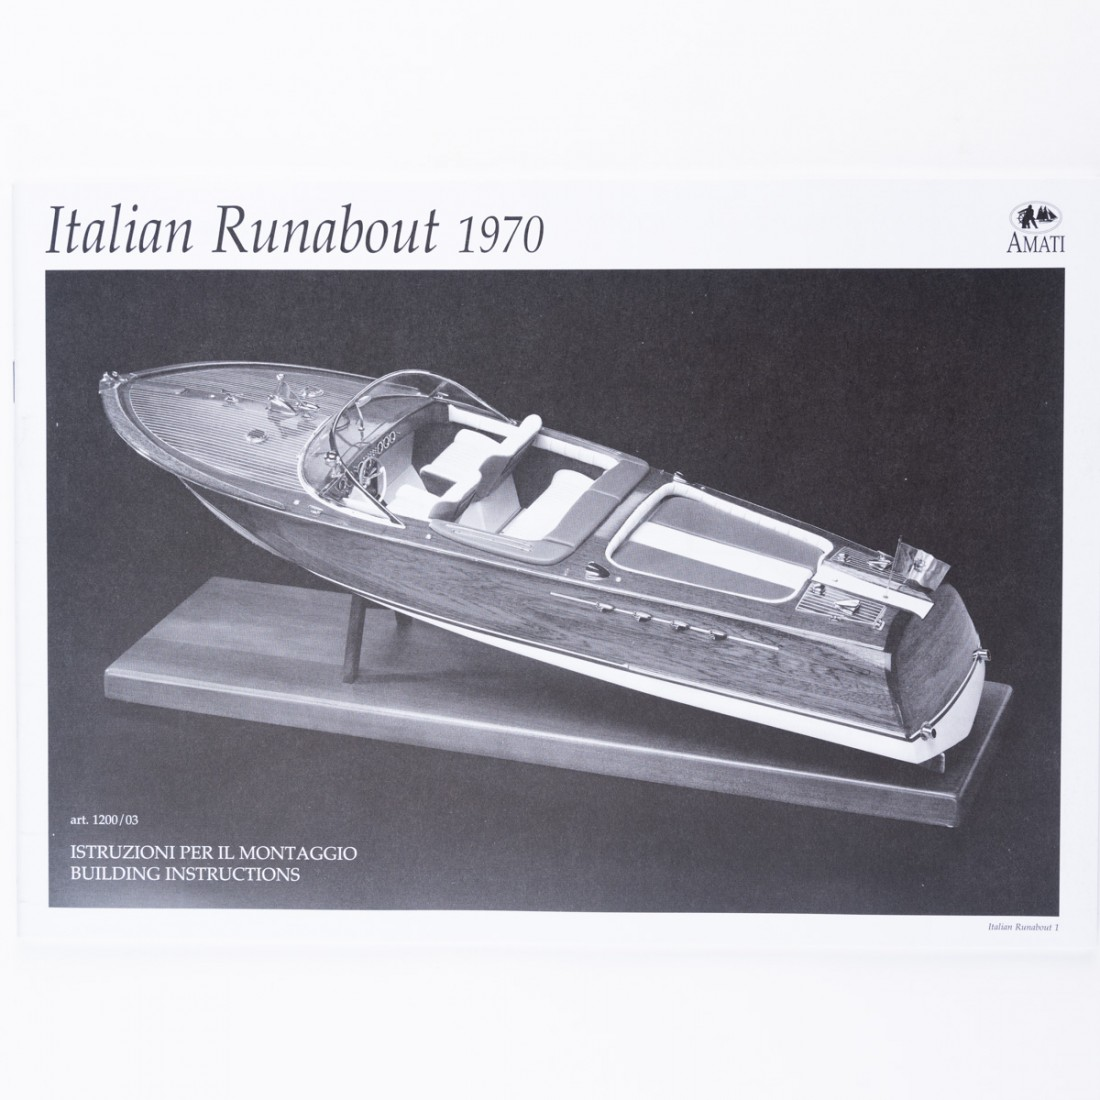 Plan Runabout 1970